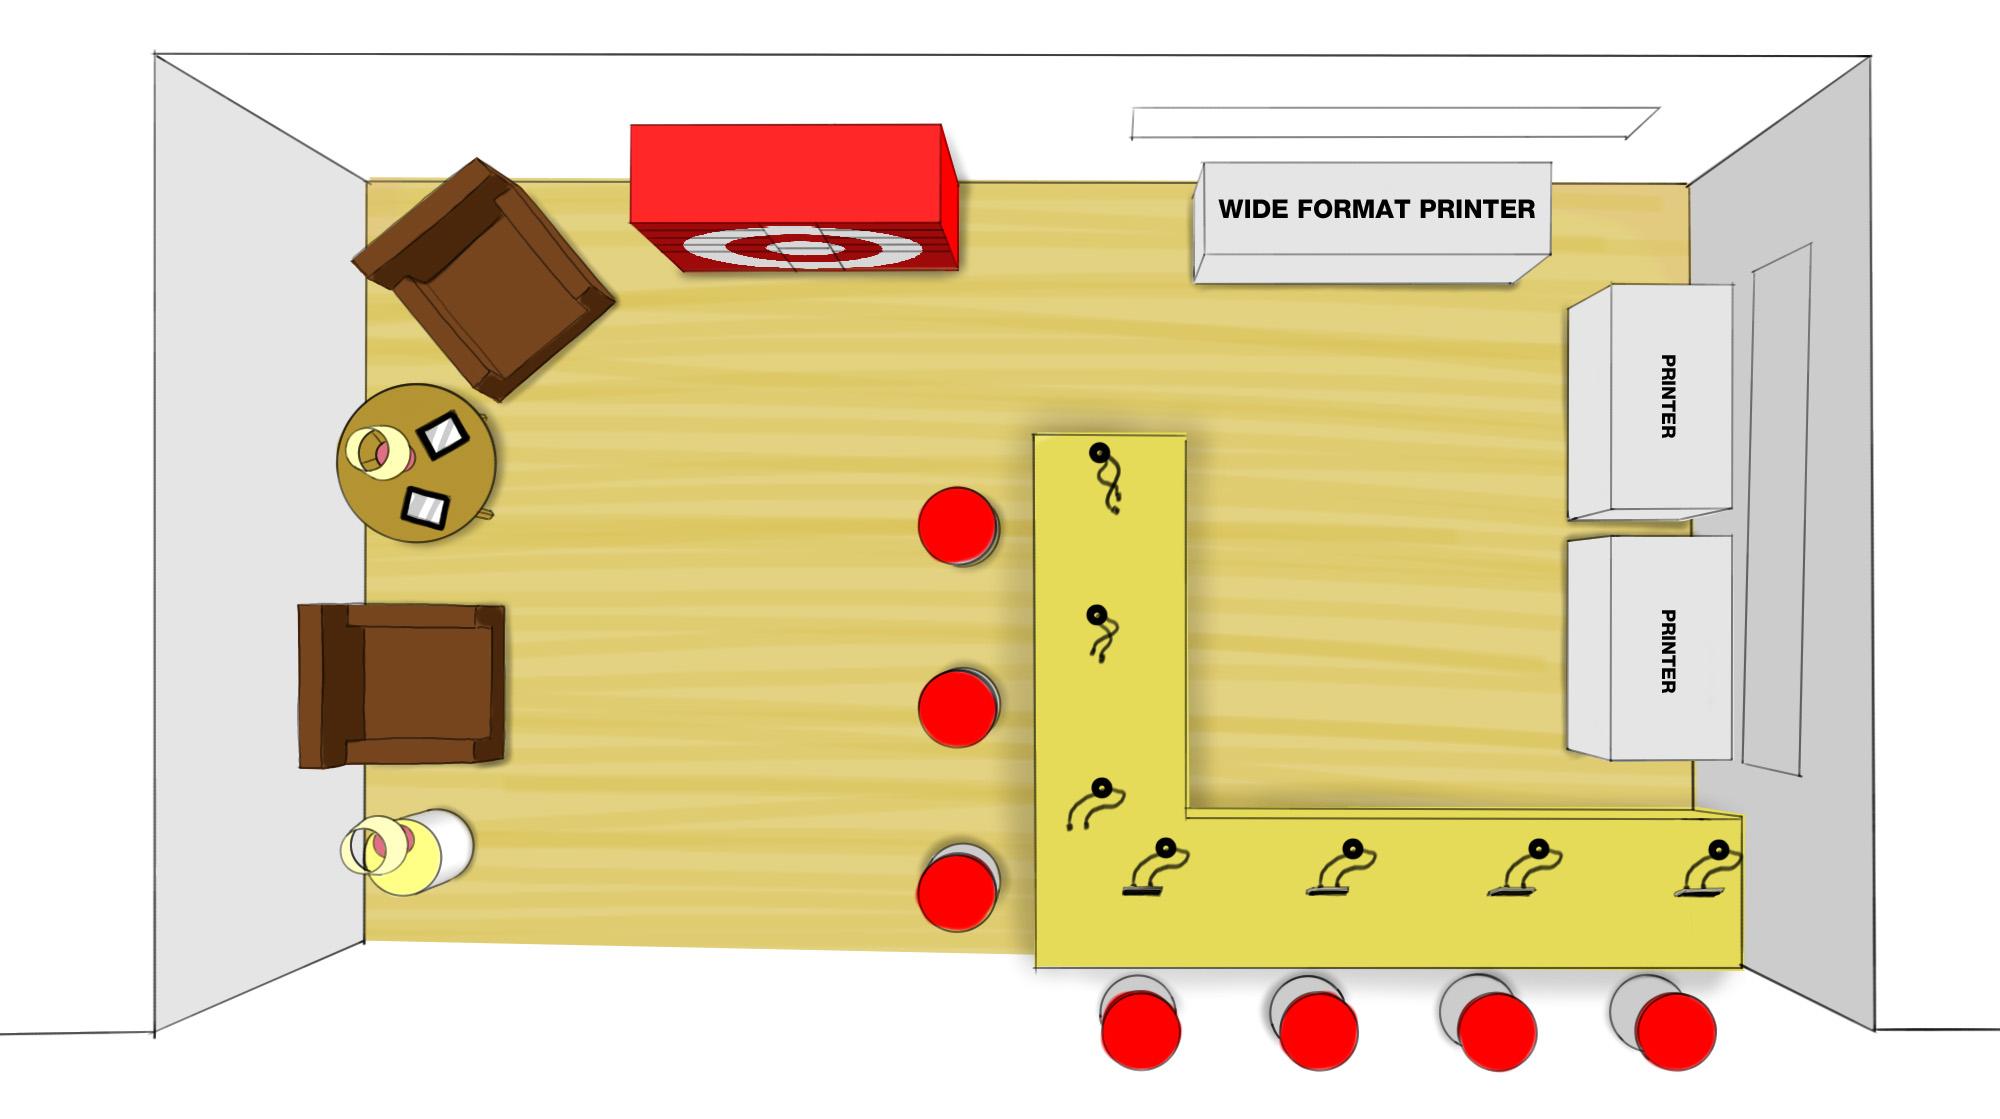 target photo kiosk planview.jpg